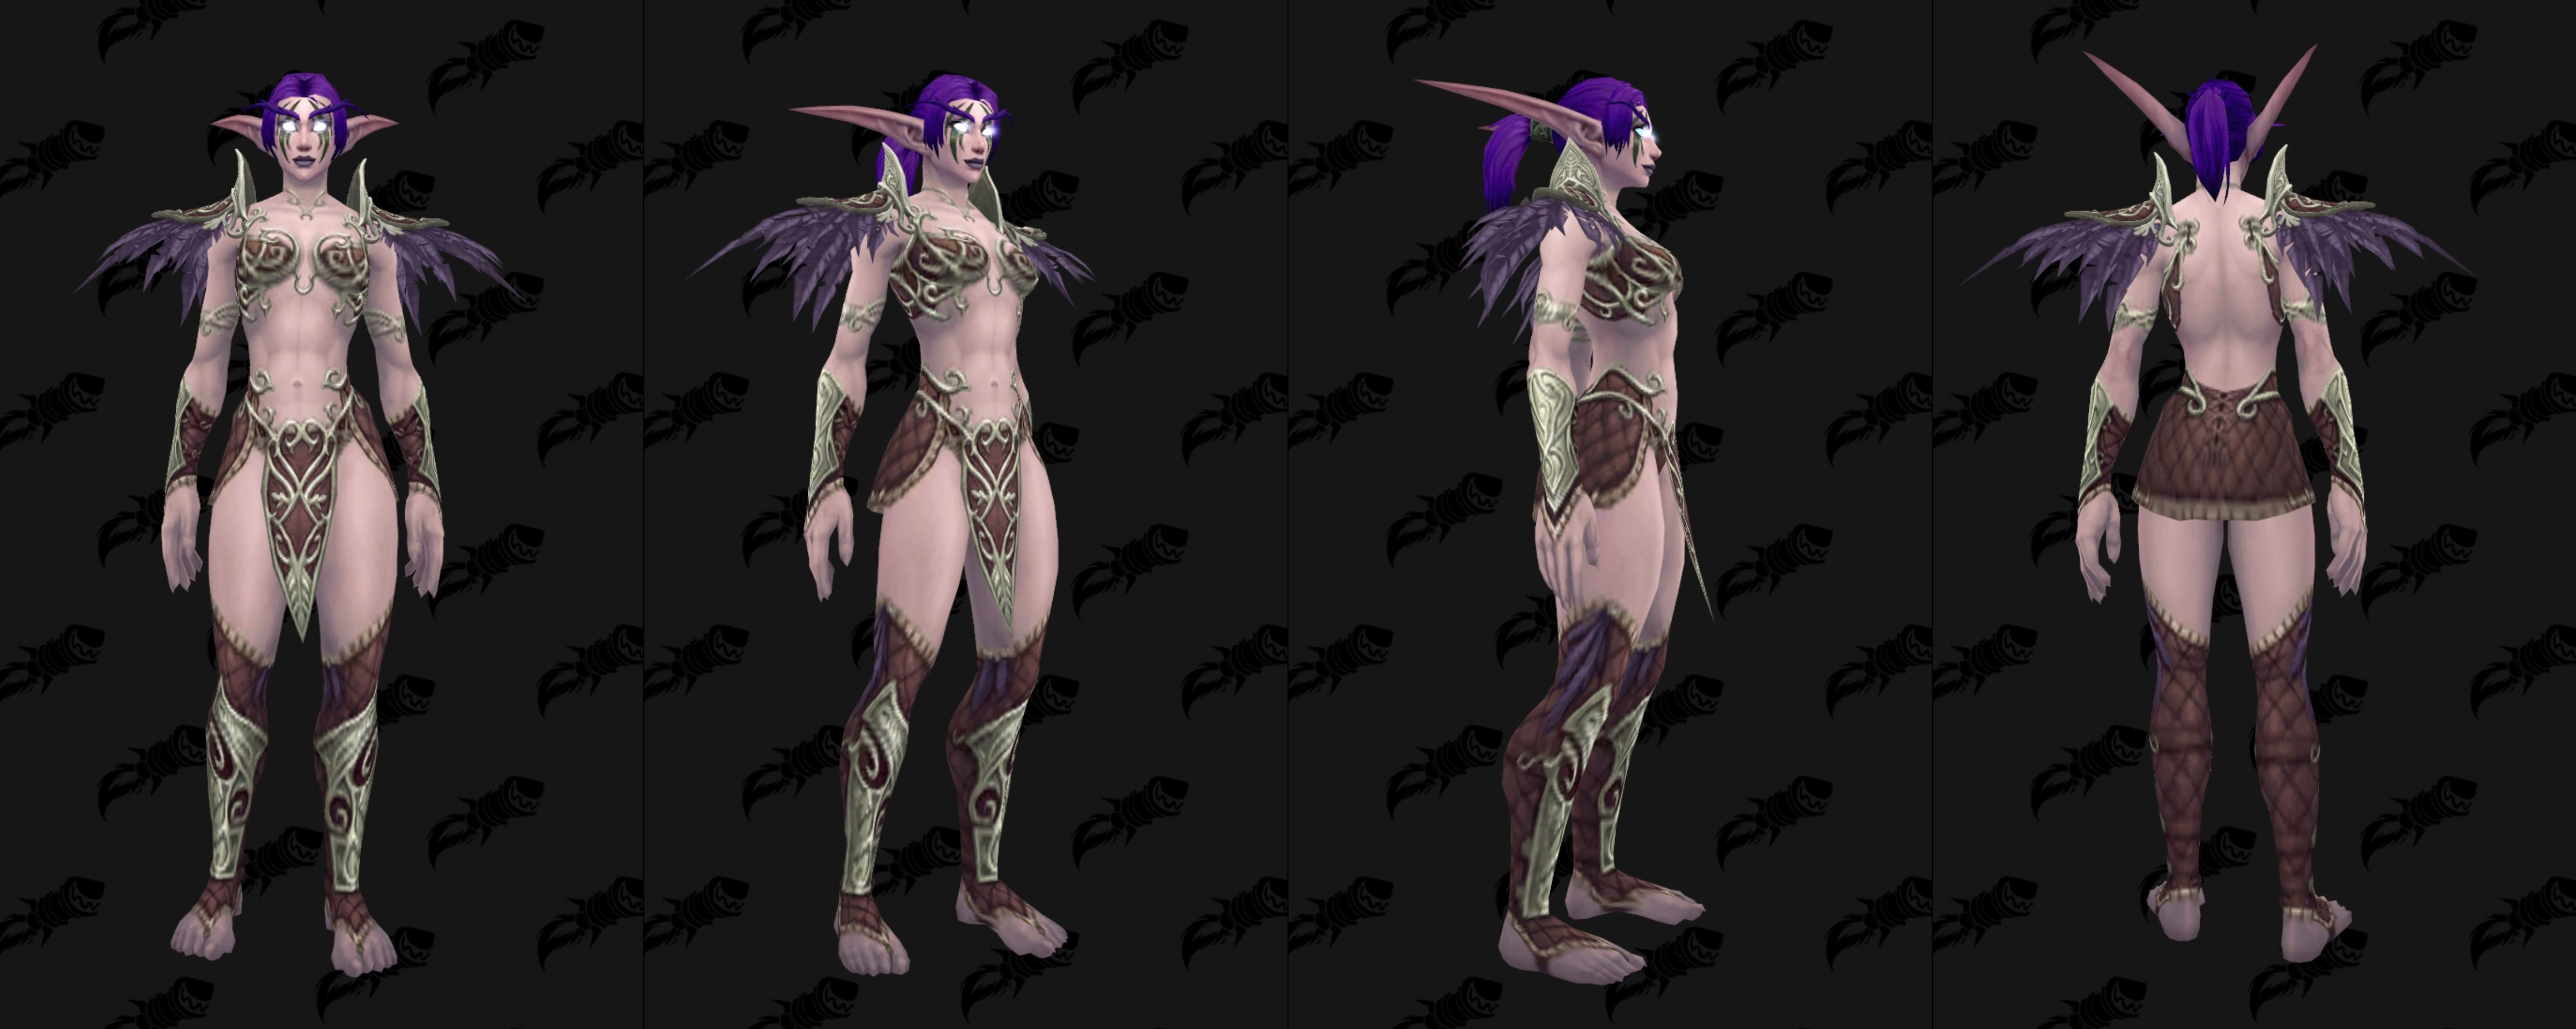 WoW Nightelf Armor Sentinel Female